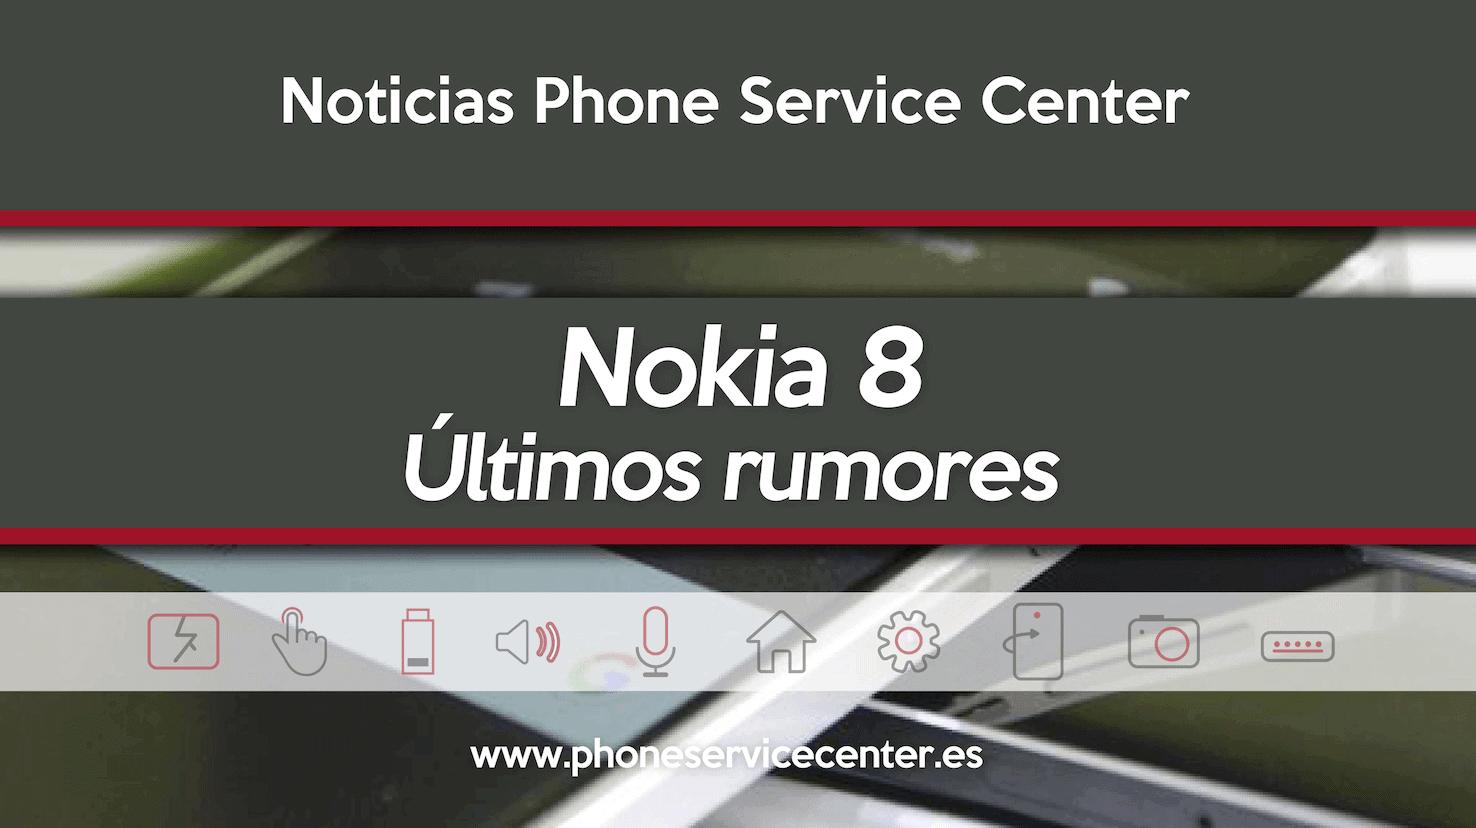 Nokia 8 ultimos rumores